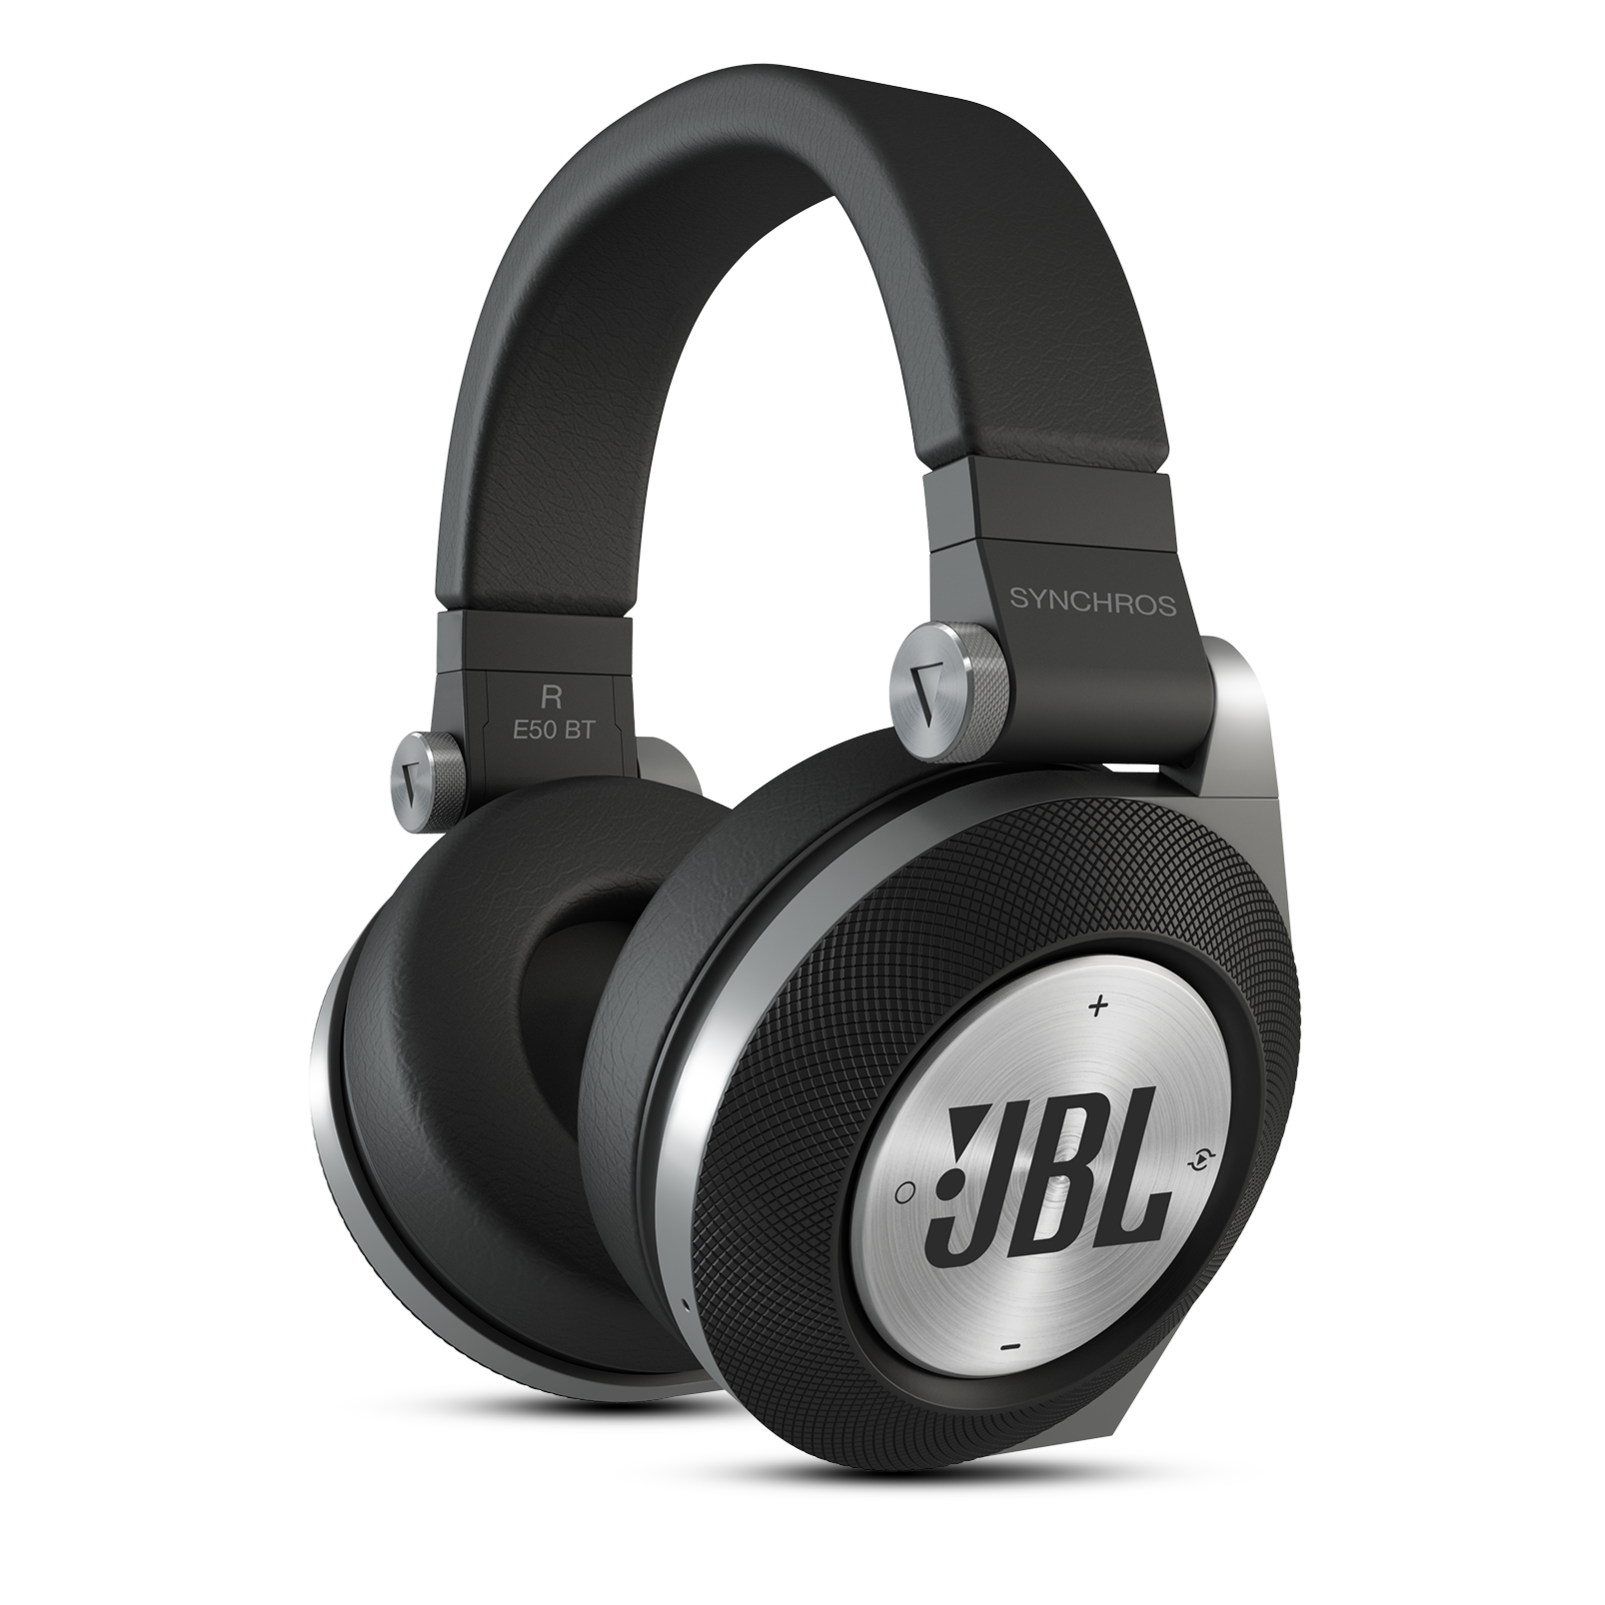 Wireless headphones bluetooth around ear - jbl headphones wireless over ear